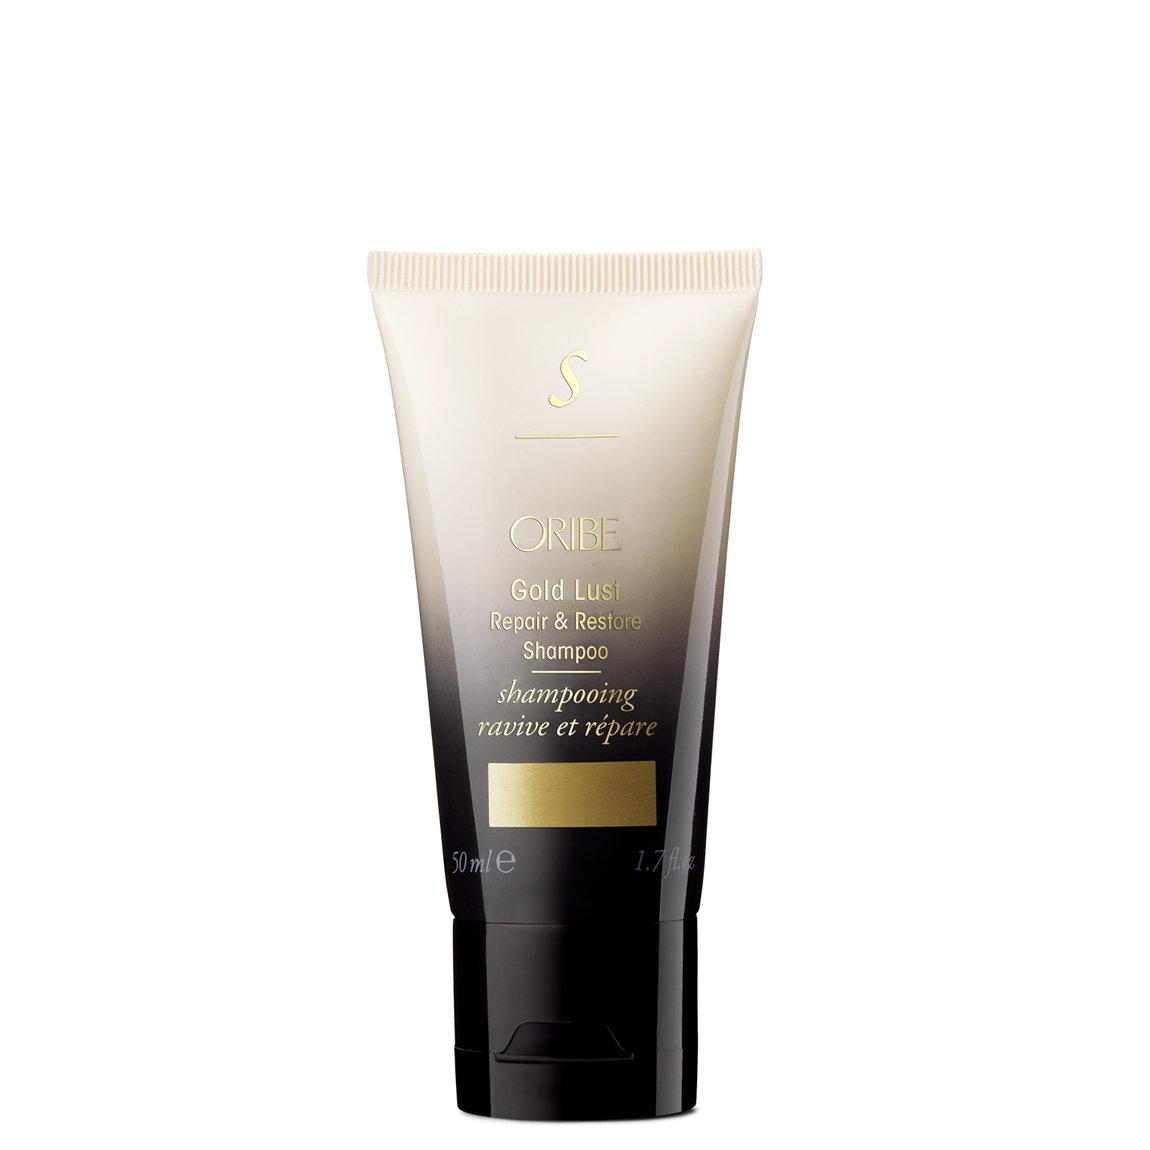 Oribe Gold Lust Repair & Restore Shampoo 1.7 fl oz product swatch.